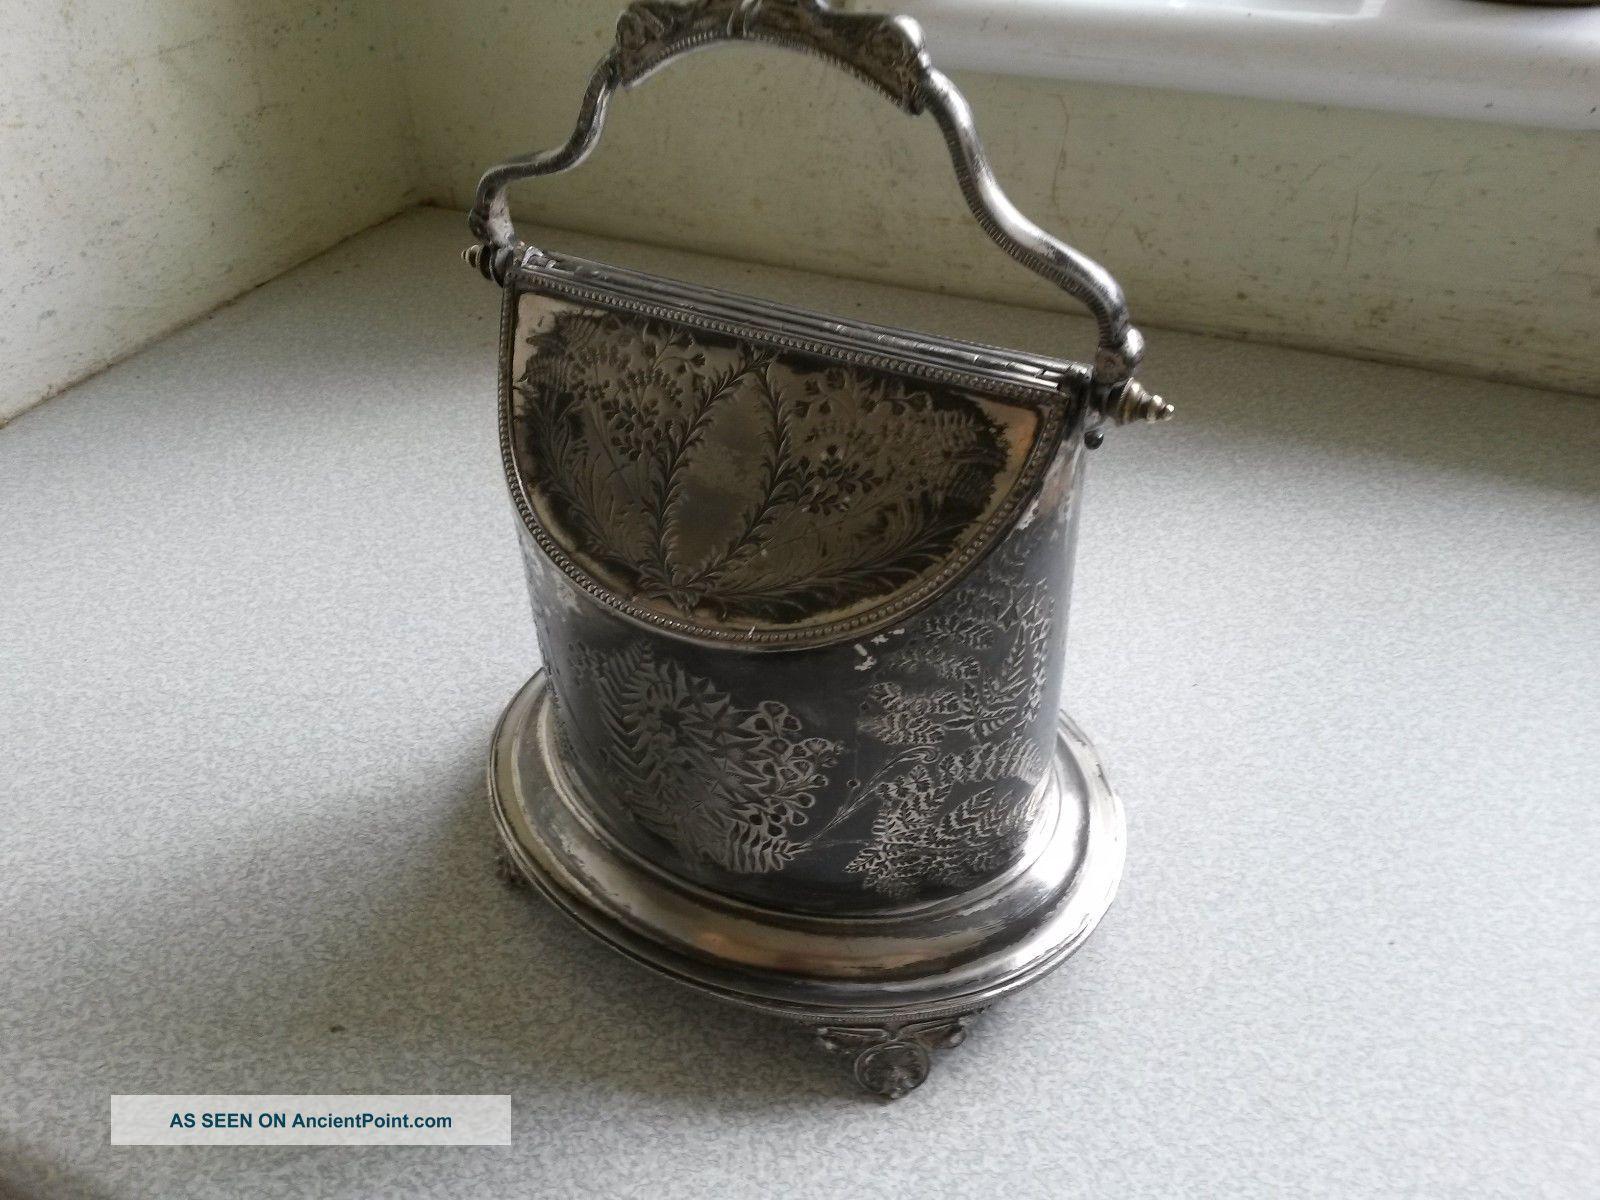 Antique Silver Plated Twin Lidded Tea Caddy / Biscuit Barrel - W Harrison 1884 Tea/Coffee Pots & Sets photo